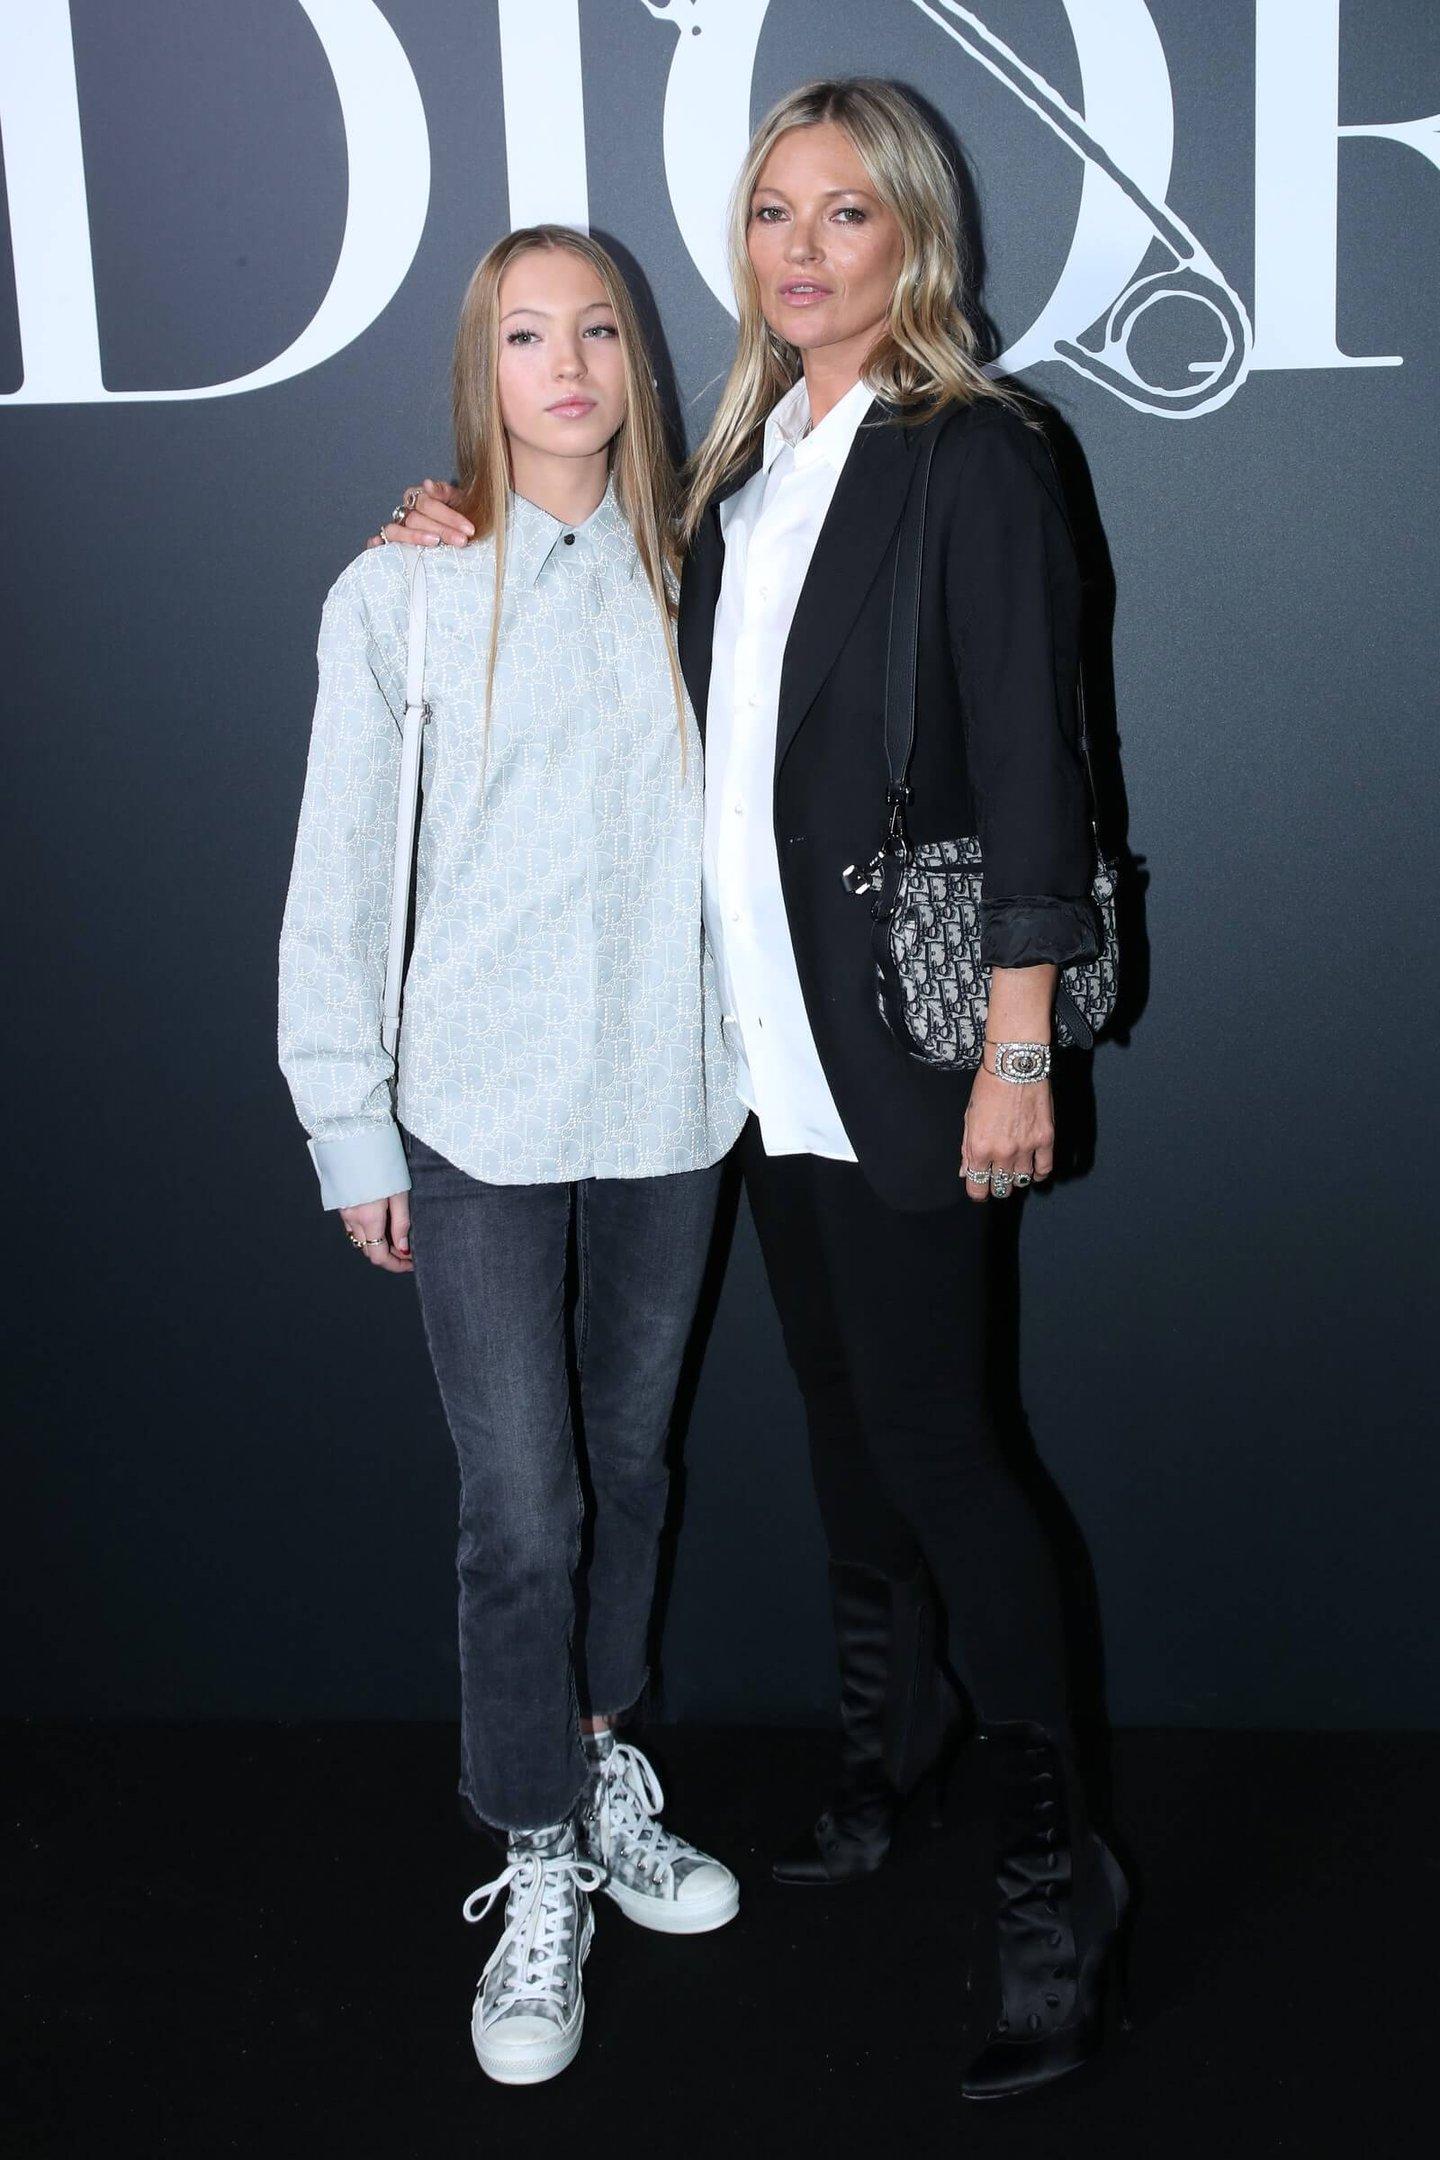 Lila Moss - Front Row - Dior - Verão - Street Style - https://stealthelook.com.br